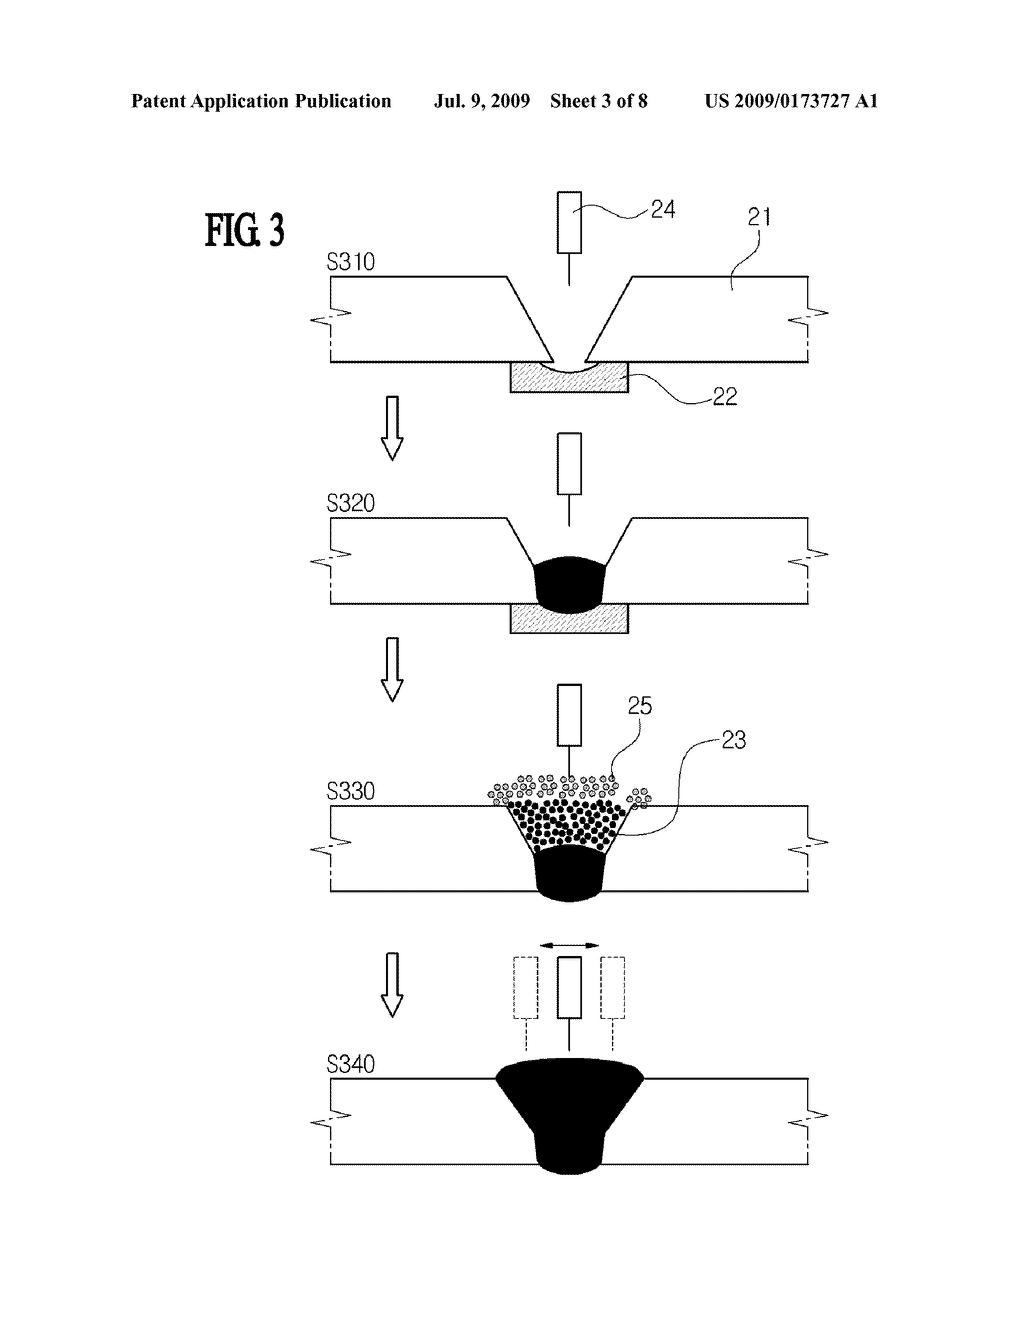 Welding Joint Diagram Enthusiast Wiring Diagrams Mig Welder Gun Butt Method Schematic And Image 04 Rh Patentsencyclopedia Com Tee